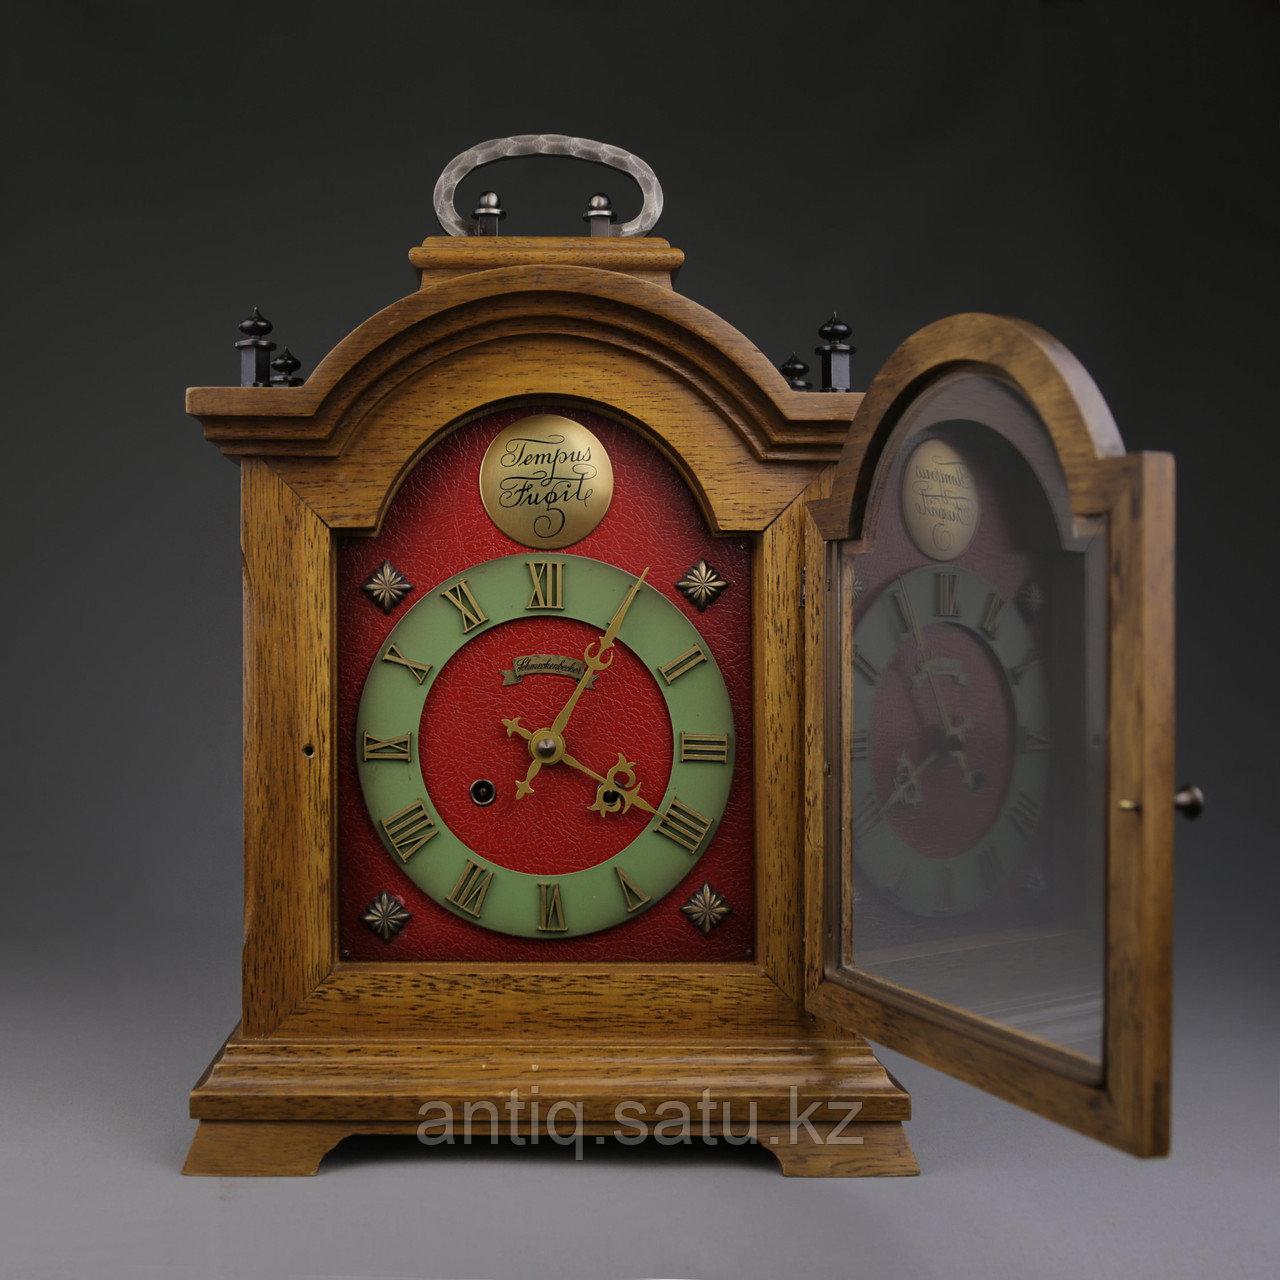 Настольные часы. Часовая мастерская Emil Schmeckenbecher - фото 2